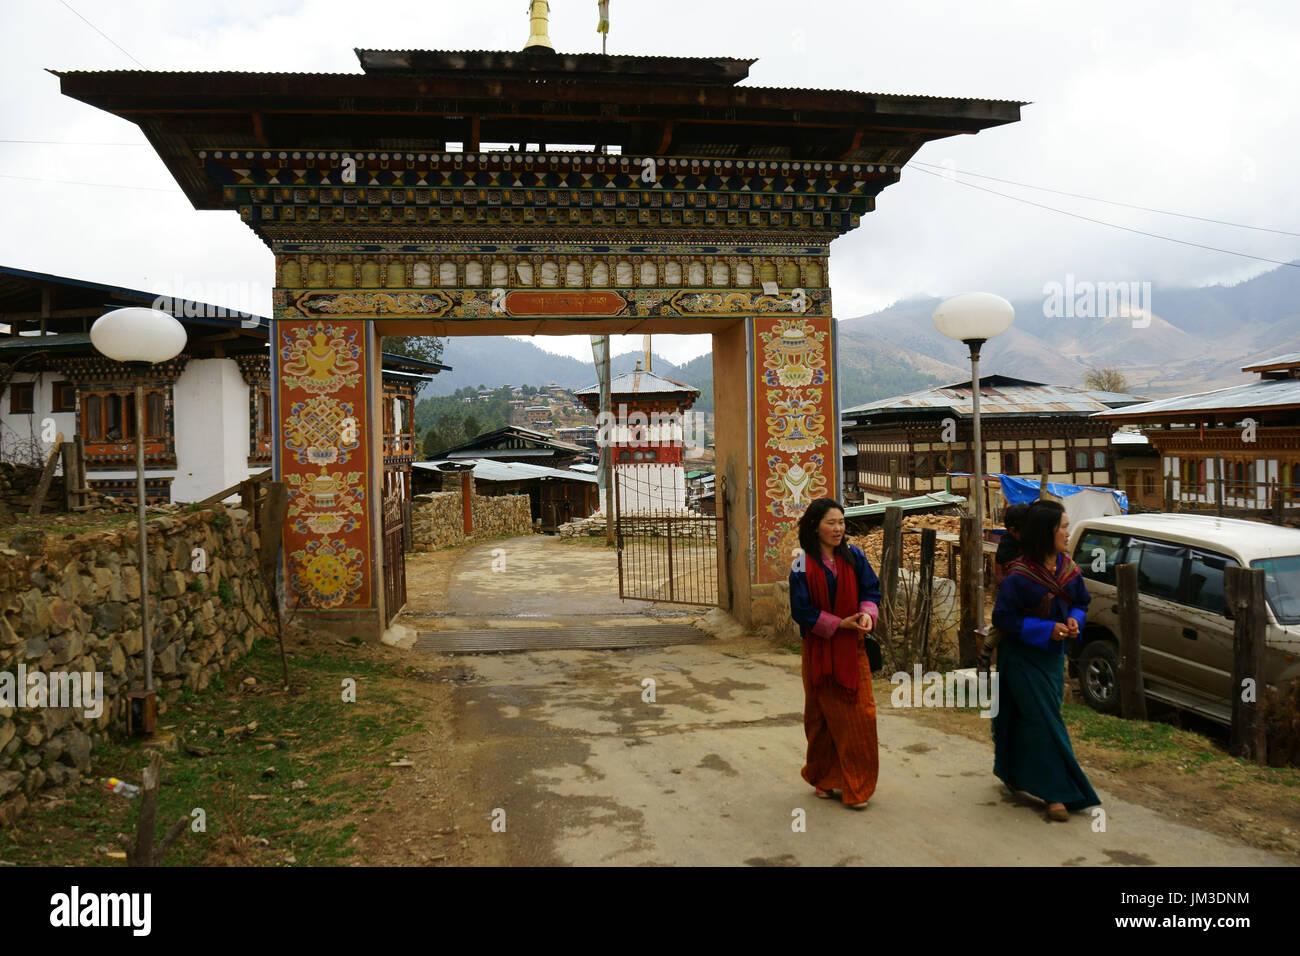 Women in traditional dress walking outside gate to the Gangtey monastery, Phobjikha valley Bhutan - Stock Image